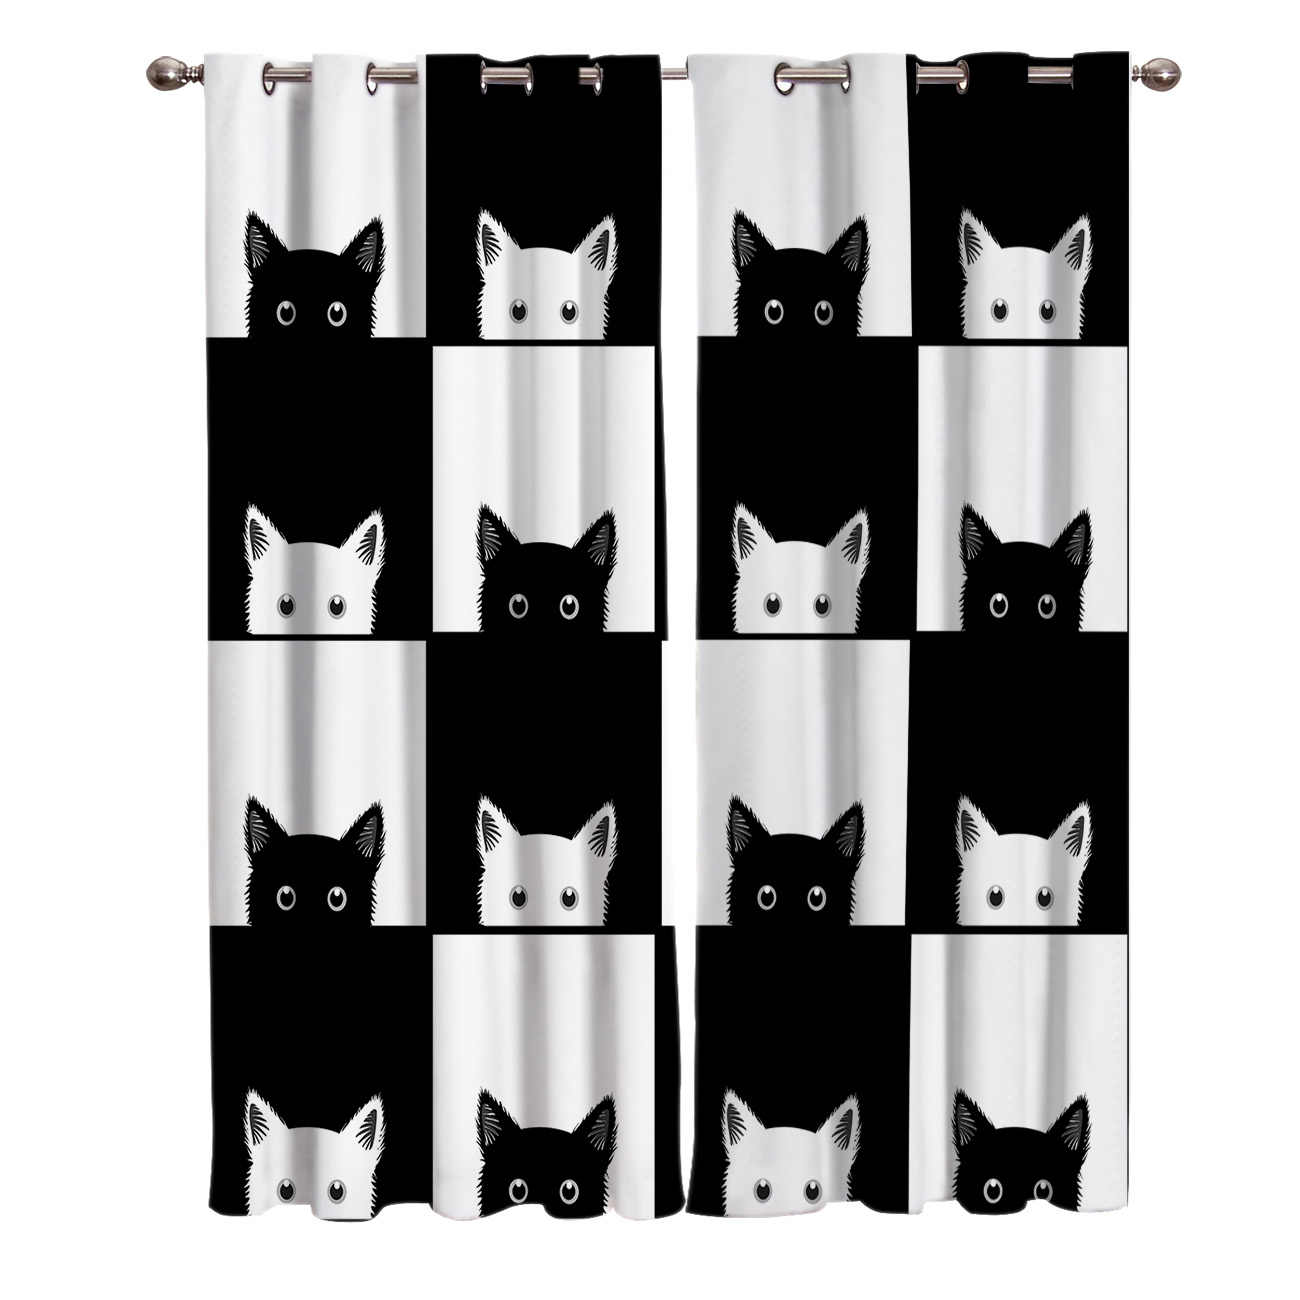 Geometic Black White Cat Window Treatments Curtains Curtain Bathroom Bedroom Kitchen Drapes Swag Kids Window Treatment Sets Curtains Aliexpress